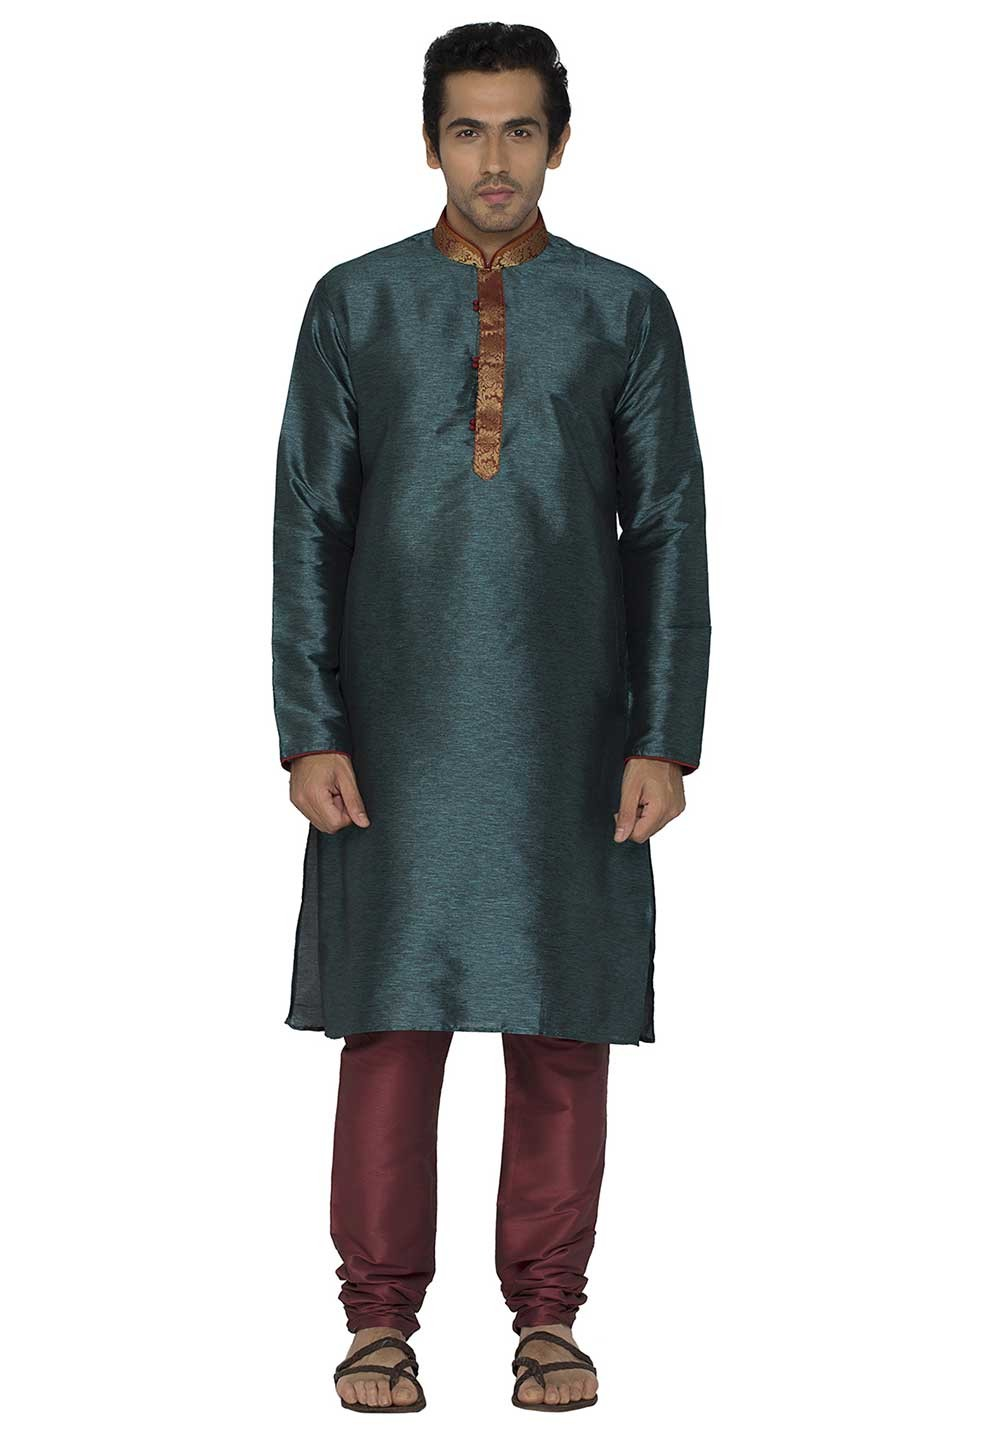 Readymade: Buy Kurta Pajama Online in Blue Colour